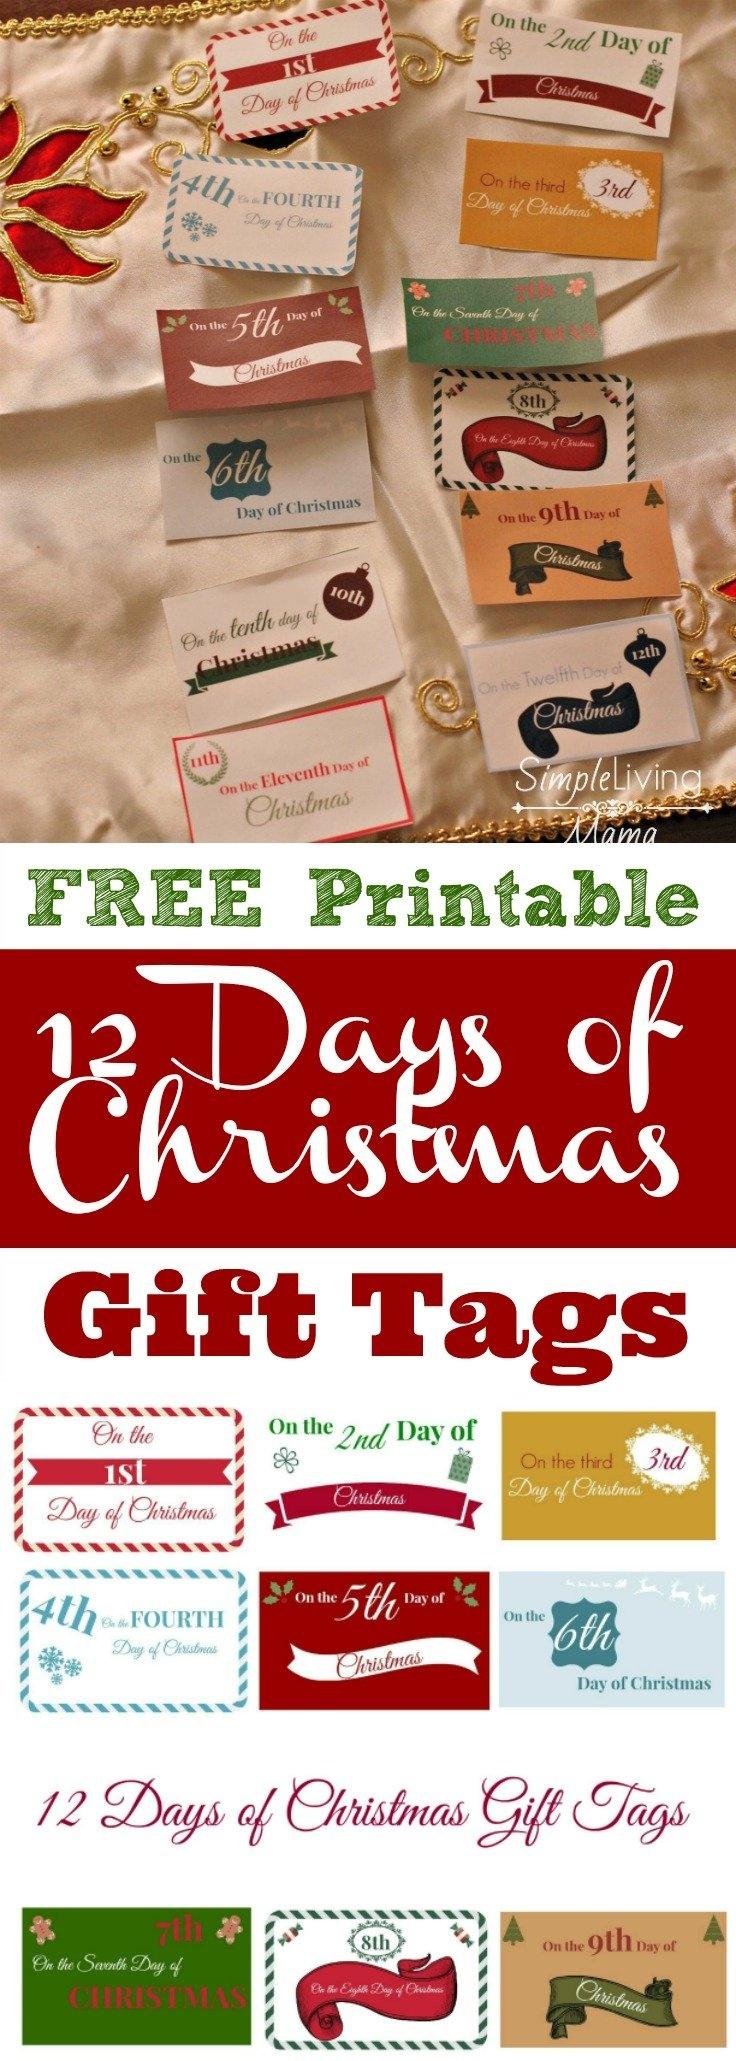 The 12 Days Of Christmas Ideas + Printable Gift Tags - Simple Living - Free Printable 12 Days Of Christmas Gift Tags